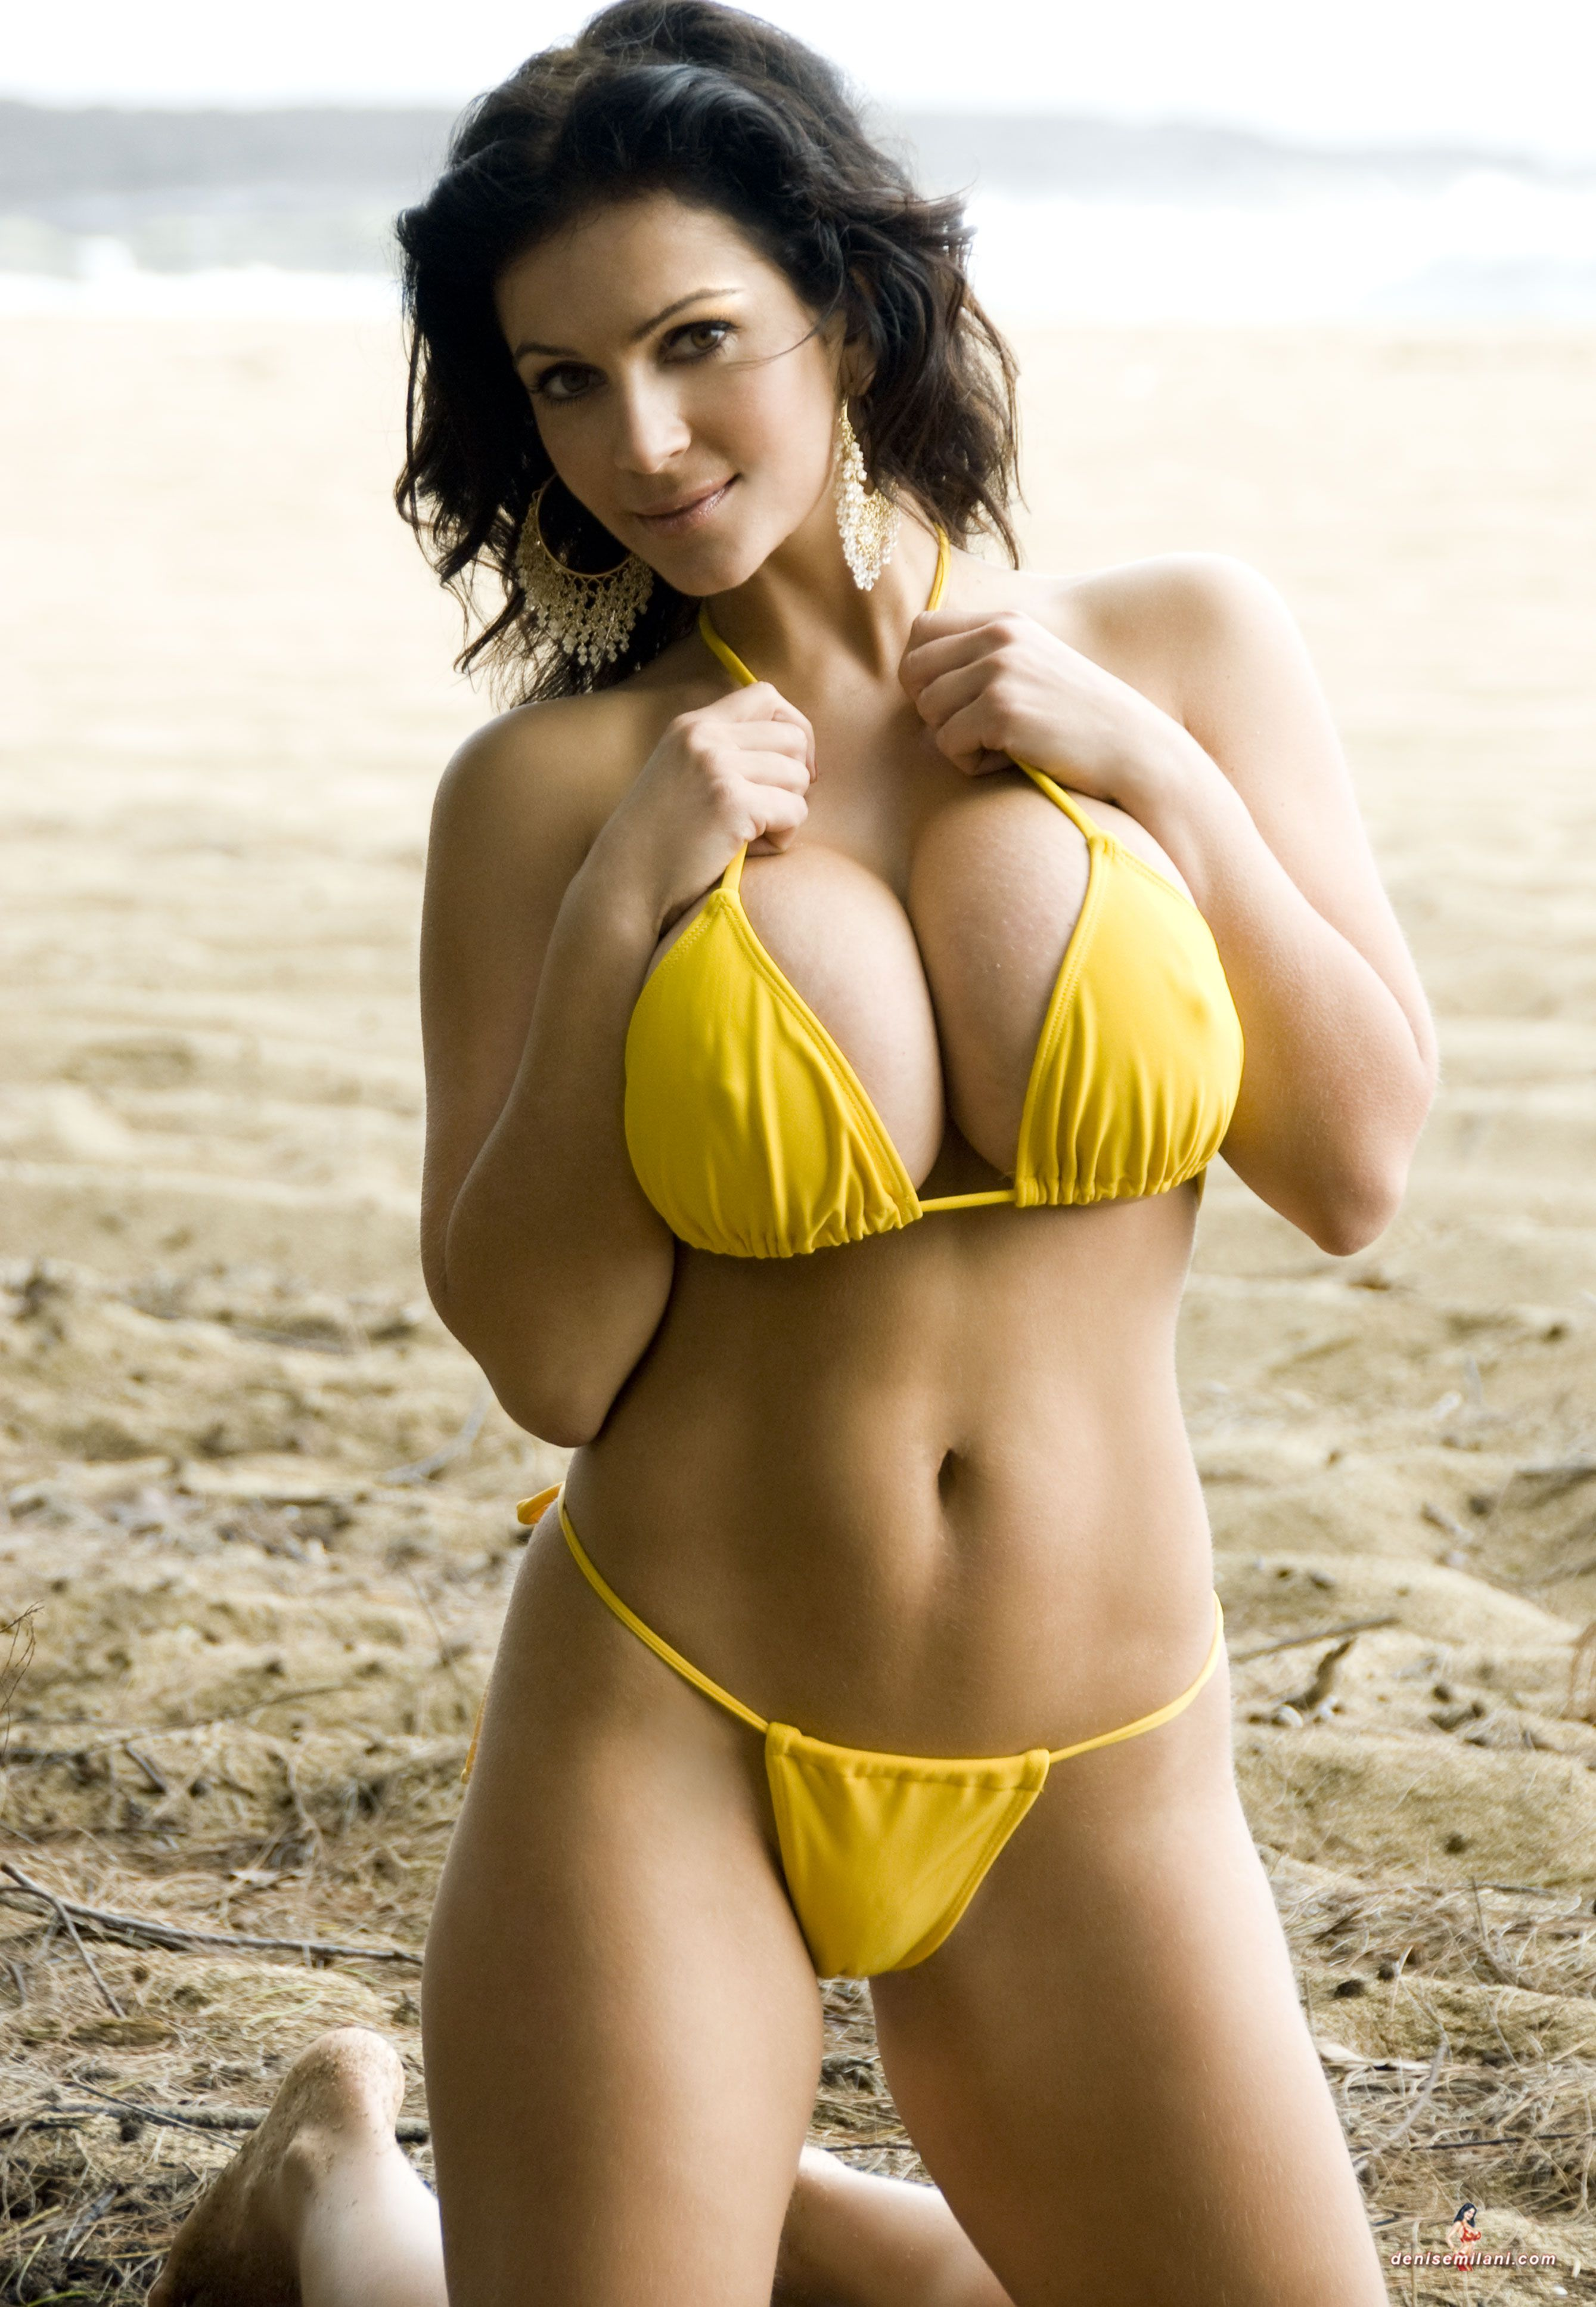 Gabrielle reece naked